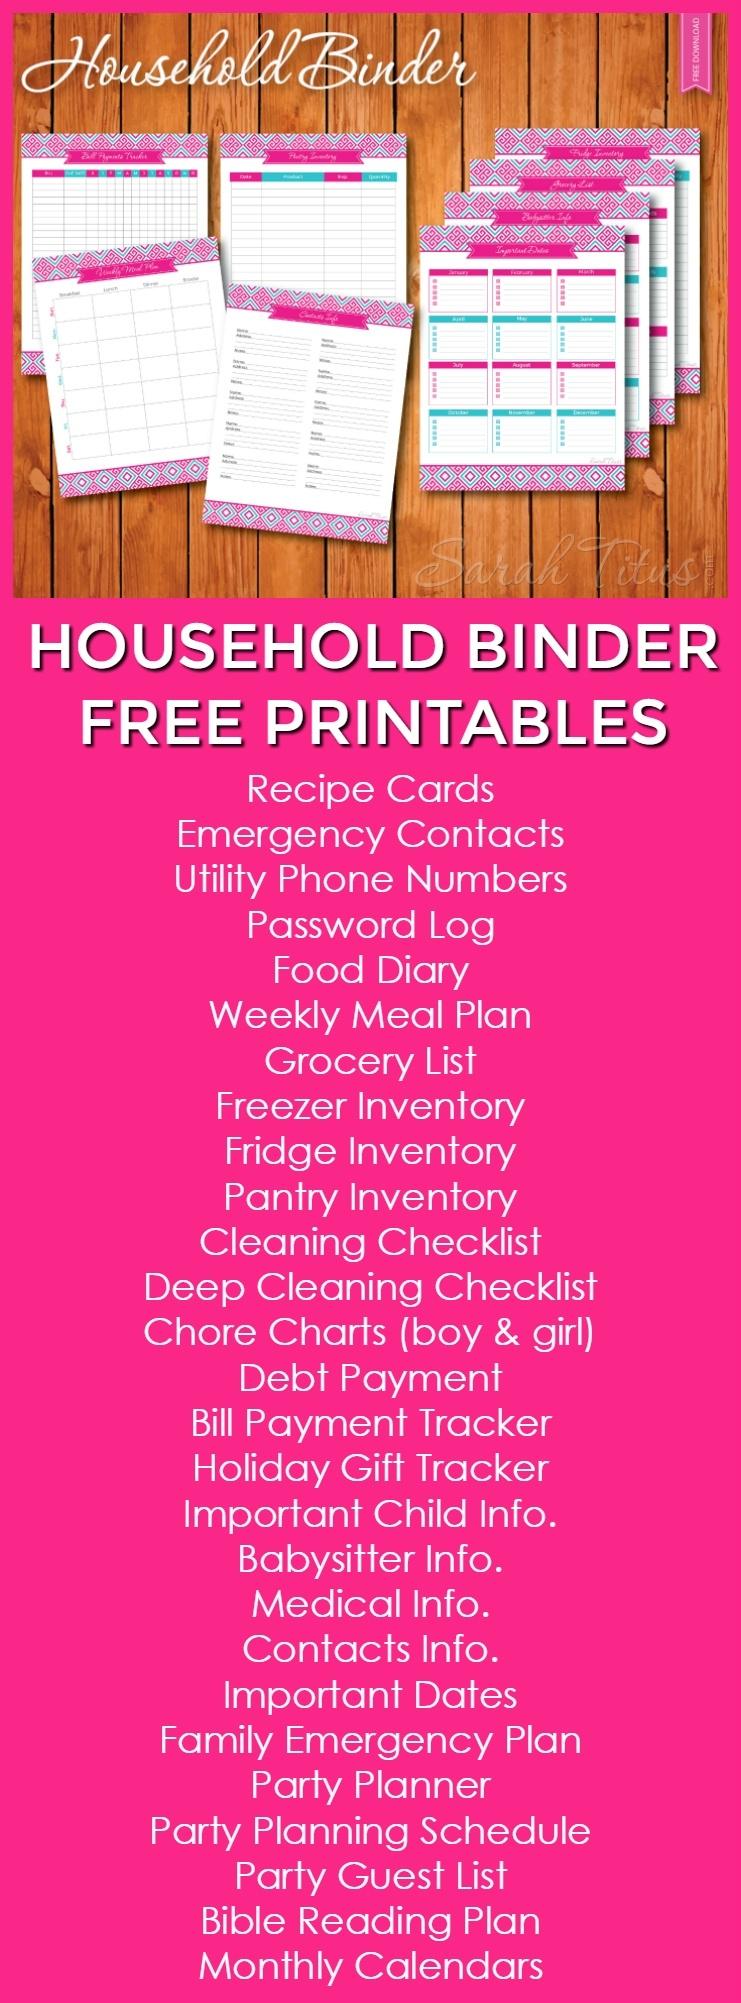 Household Binder Free Printables - Sarah Titus  Utility Bills Payment Printable List